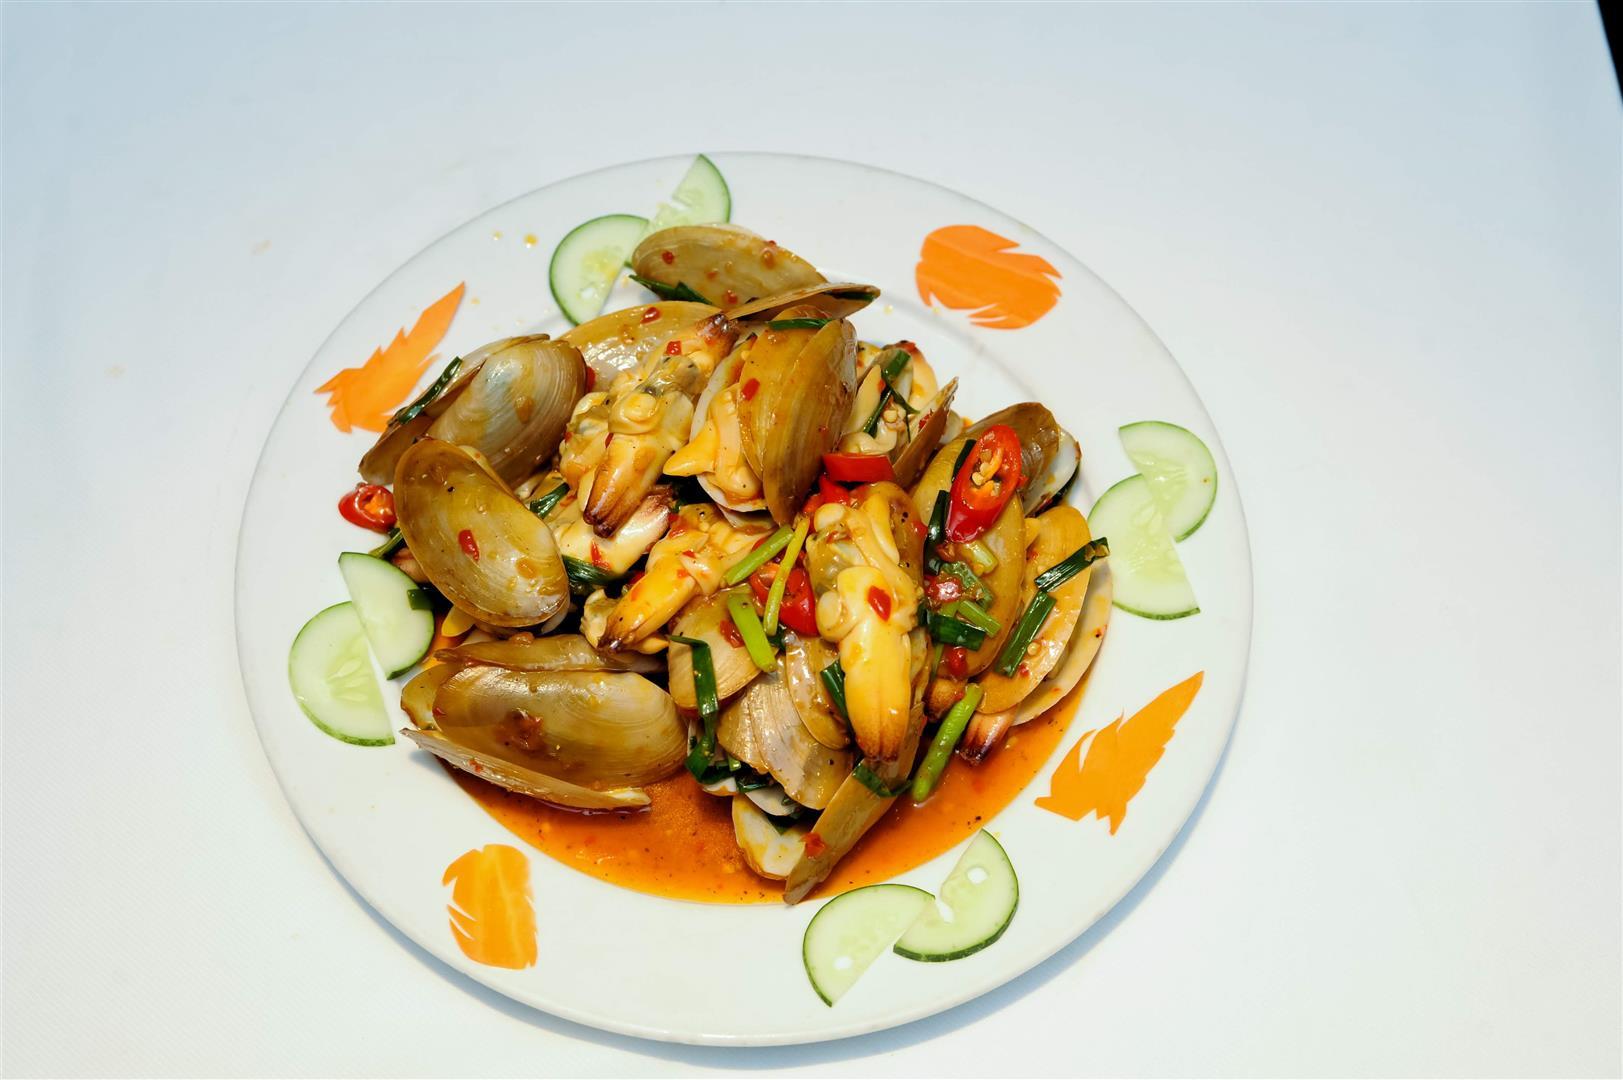 Tu Hài Xào Sả Ớt / Geoduck Stir-fried with chili and lemongrass